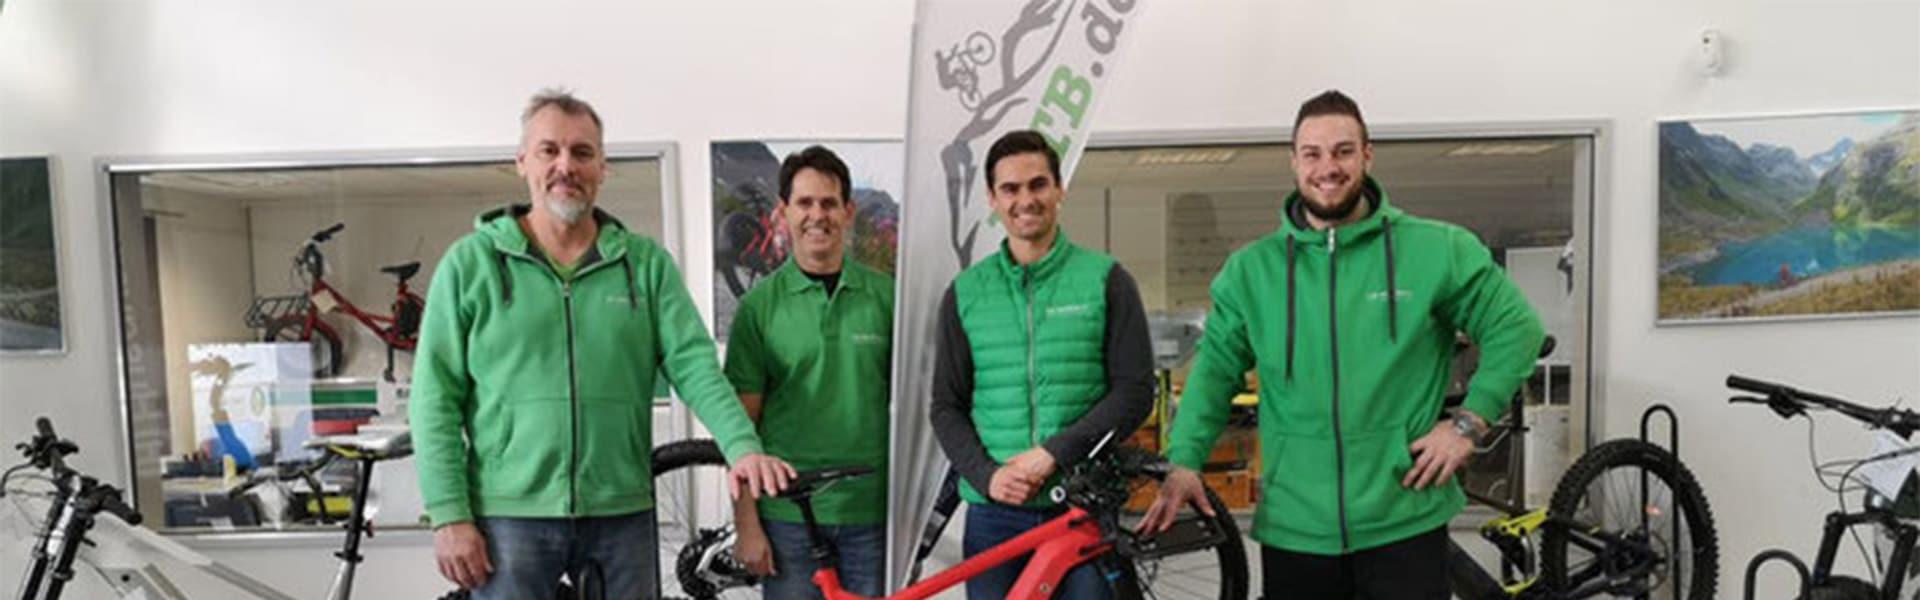 Das Team der e-motion e-Bike Welt München West